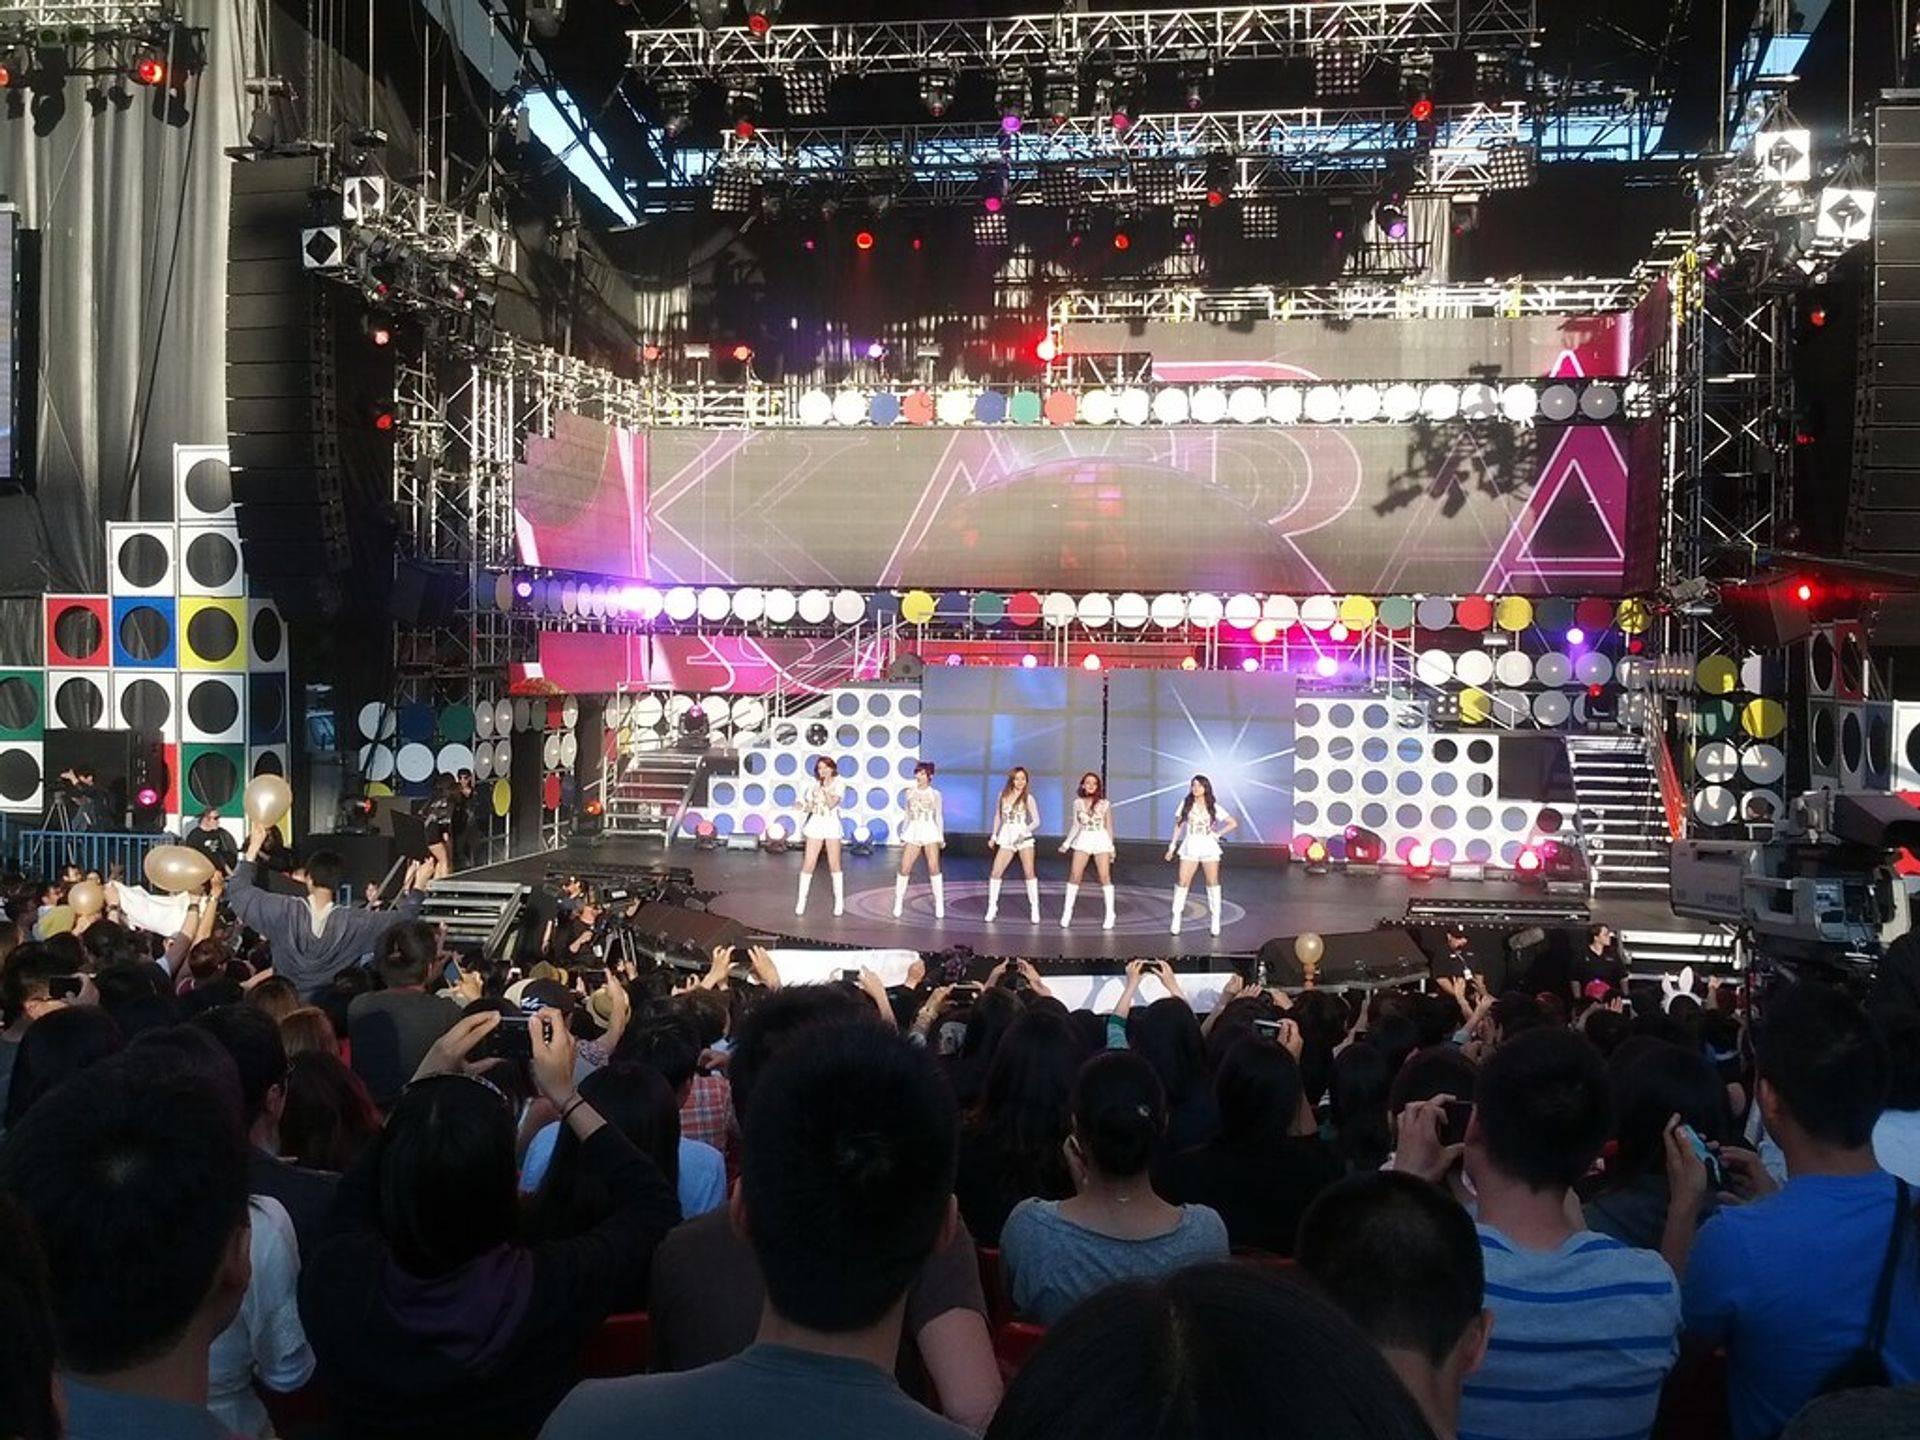 Kpop performance live on stage